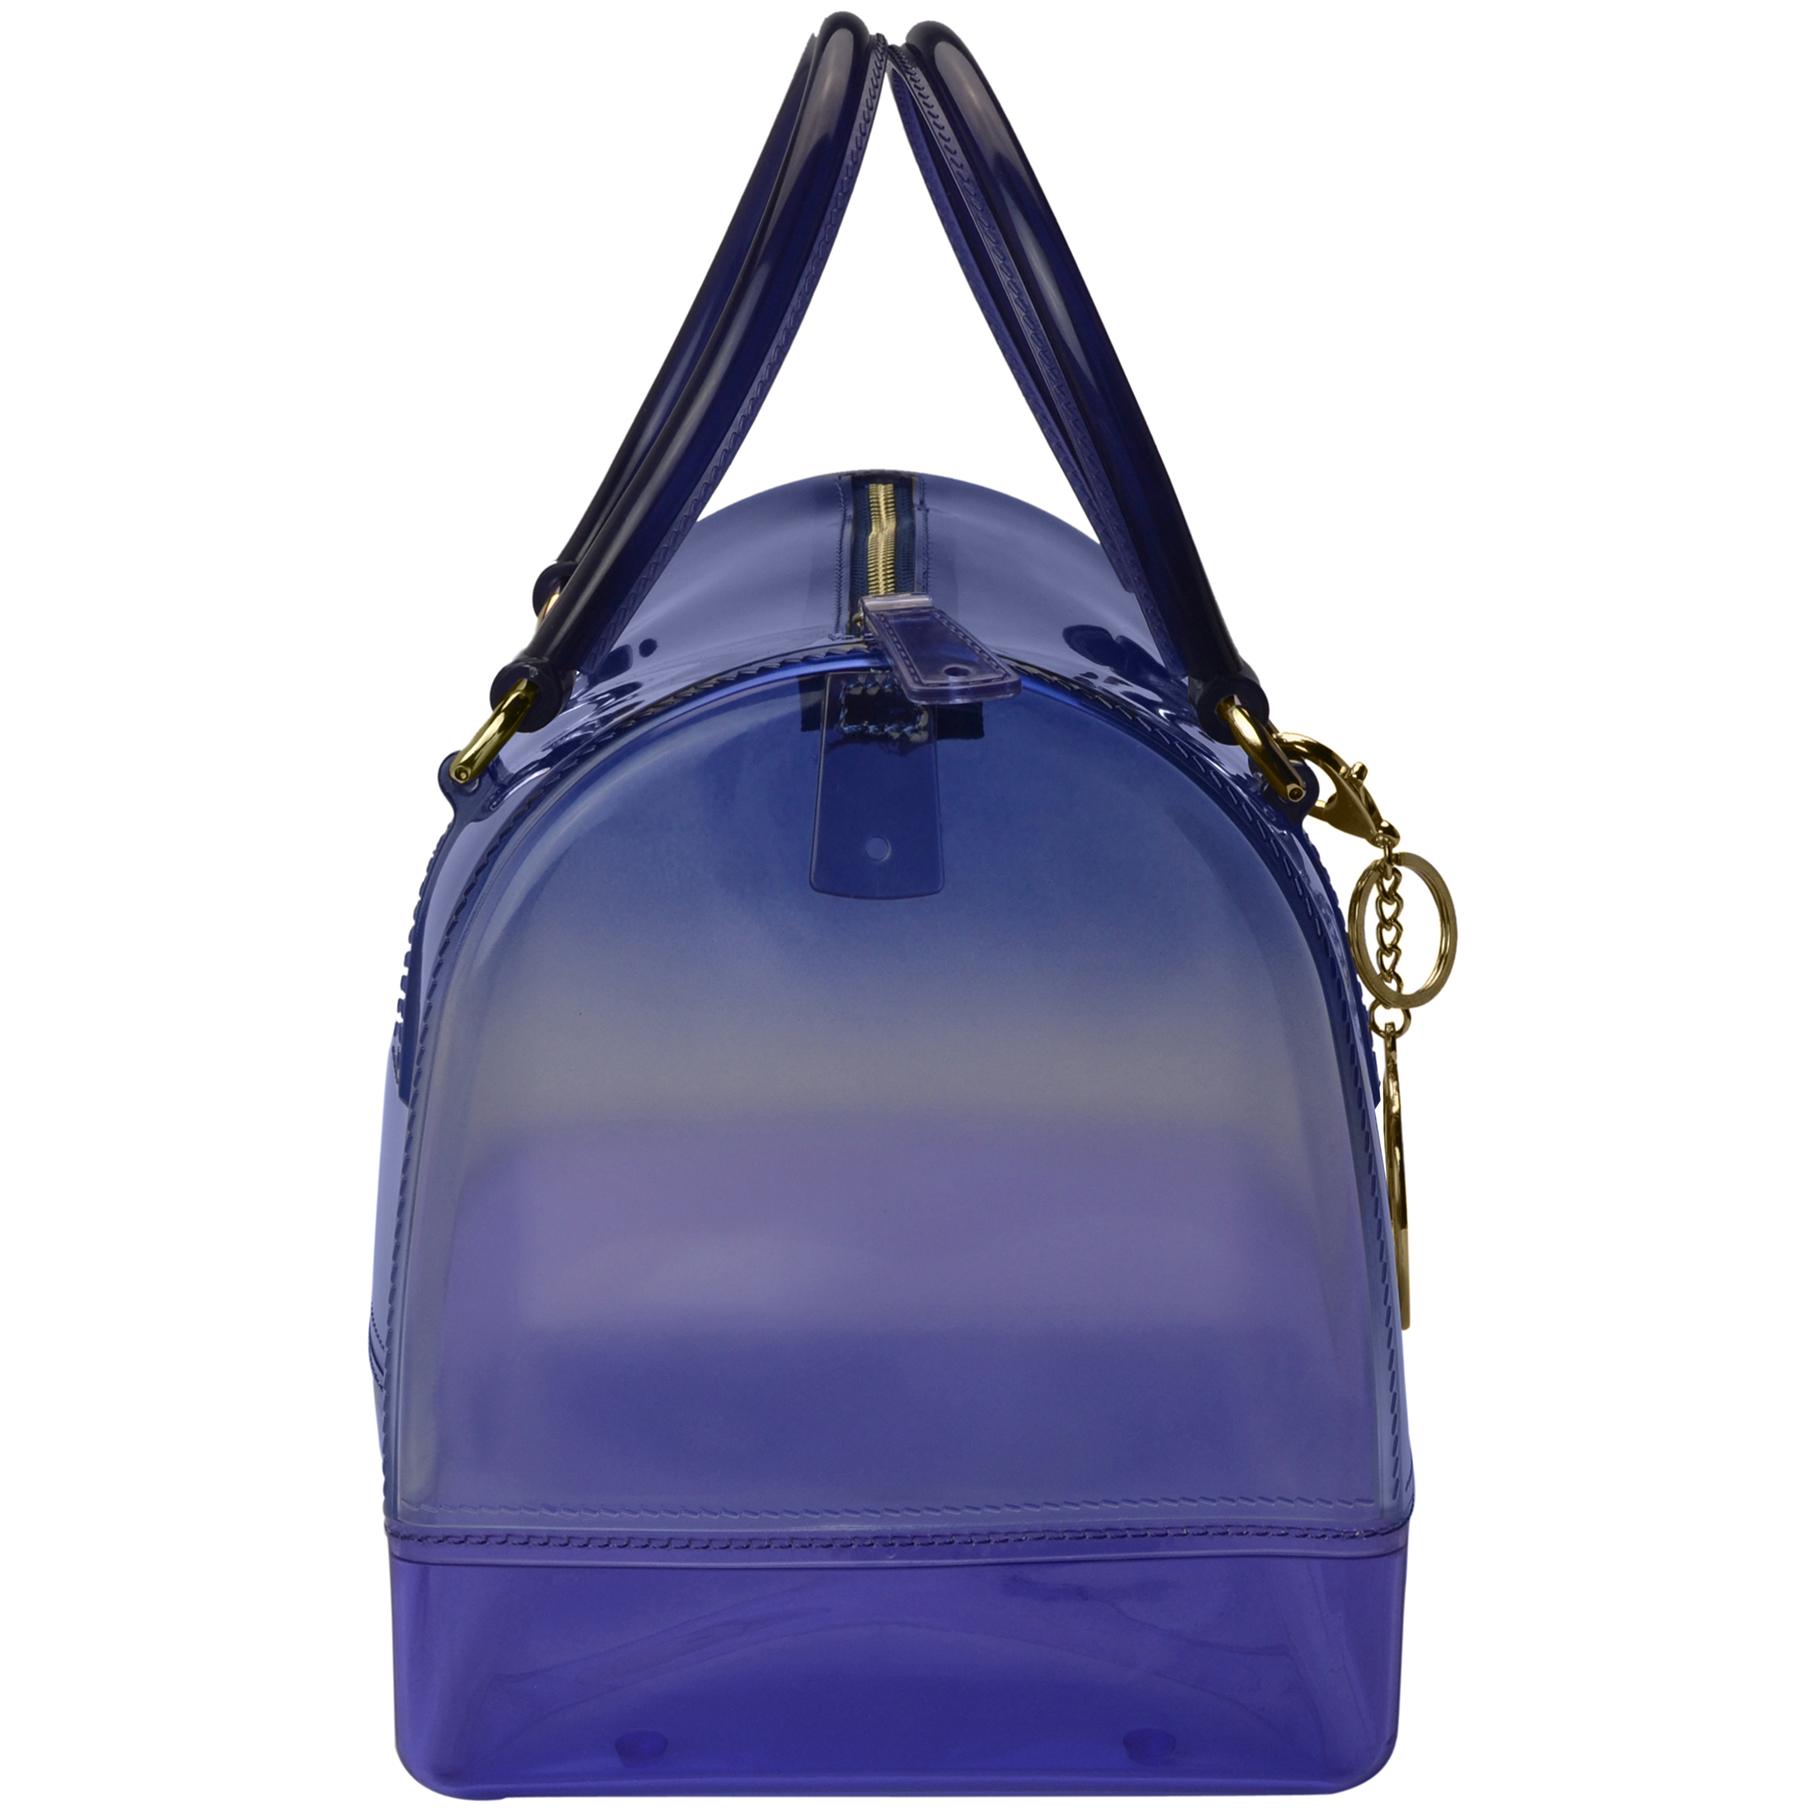 mg-collection-kaley-jelly-style-tote-handbag-jsh-lmq-608nvpp-3.jpg